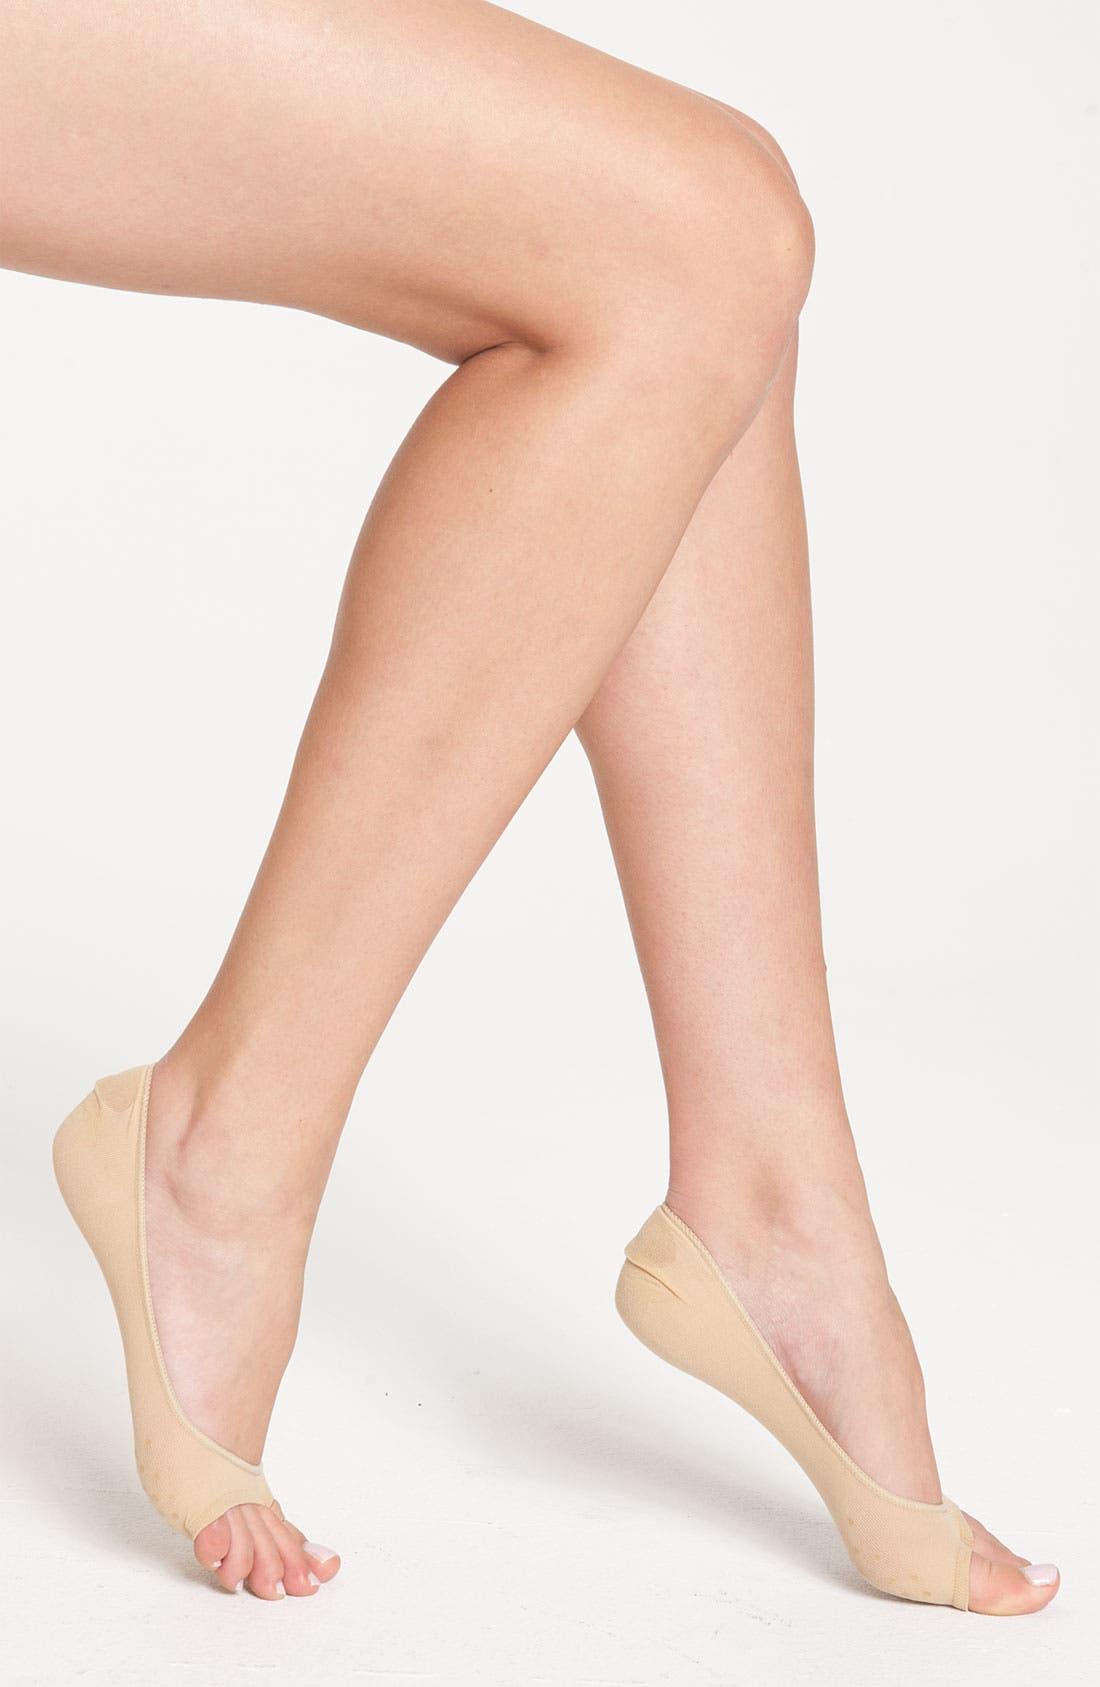 Alternate Image 1 Selected - Hue 'PB Peekaboo' Liner Socks